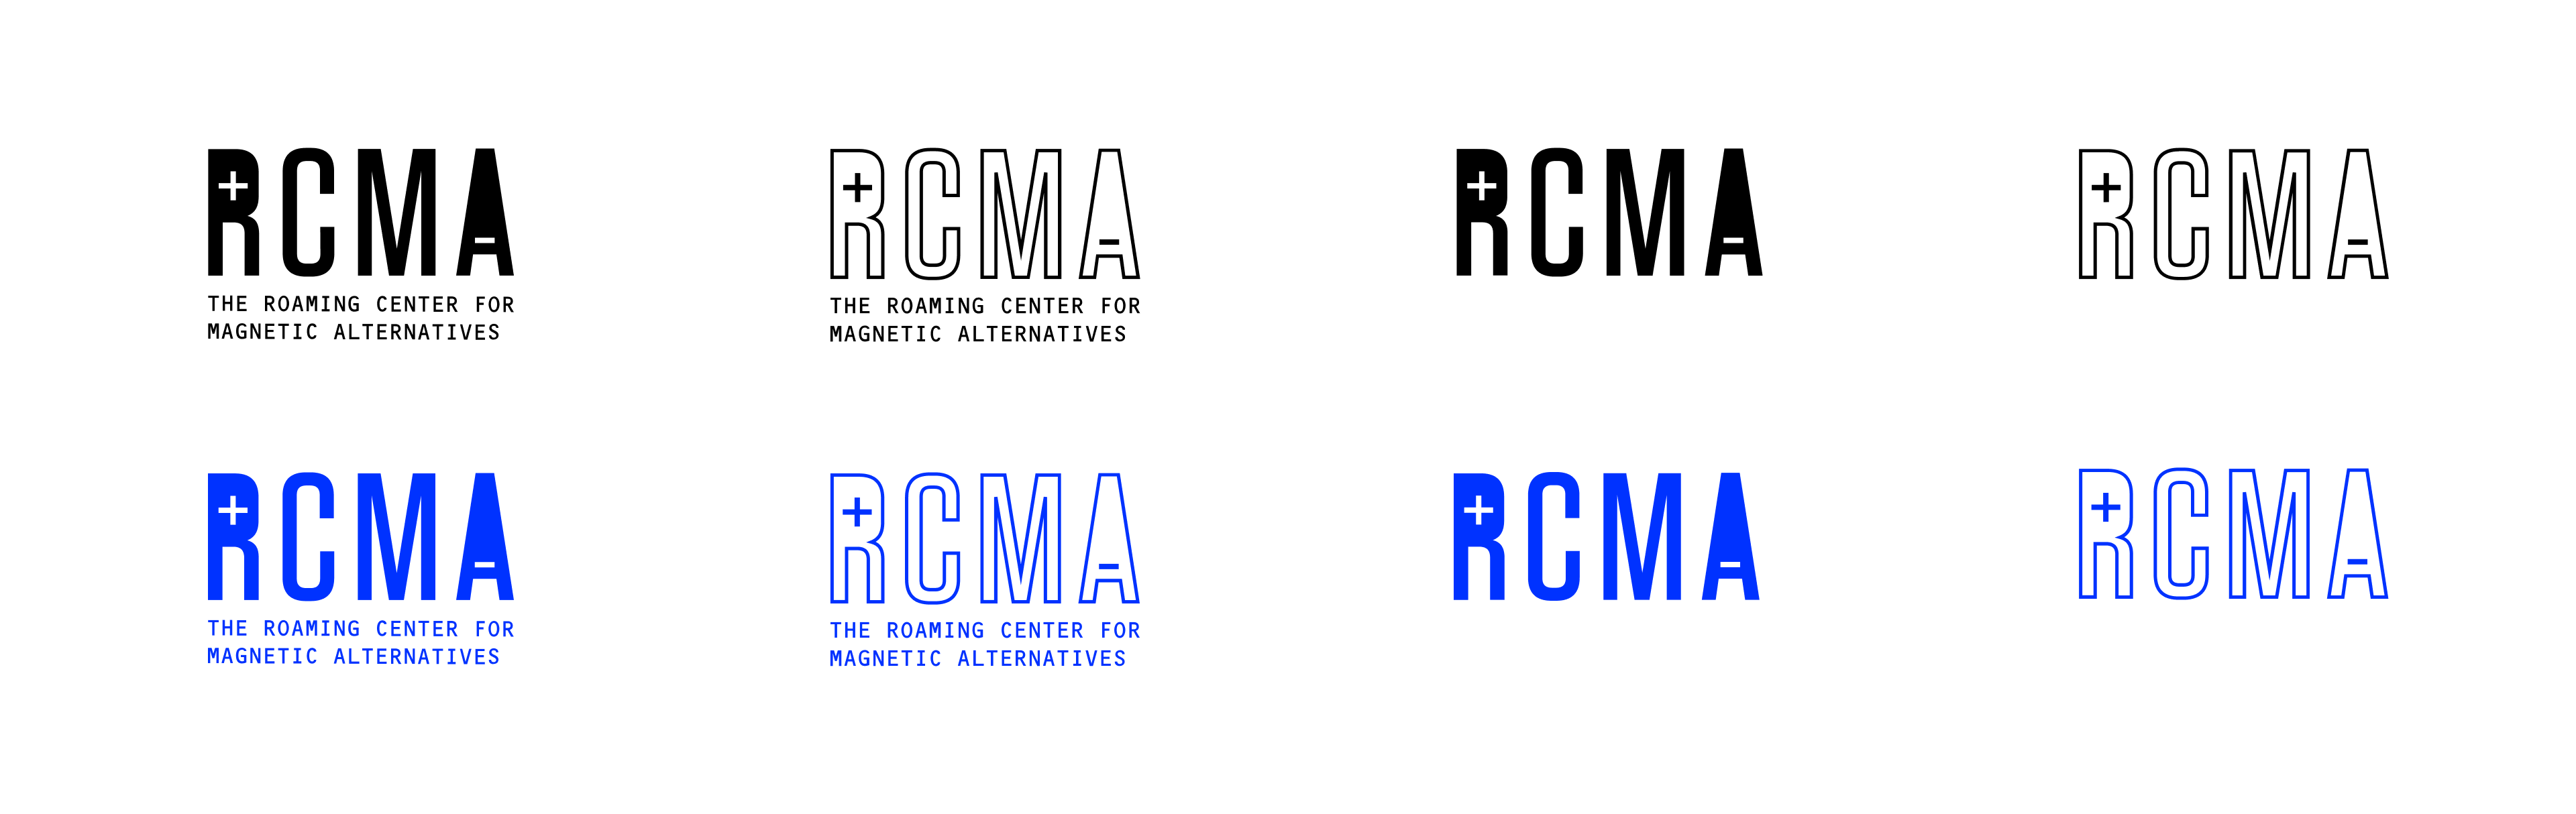 RCMA Logotypes